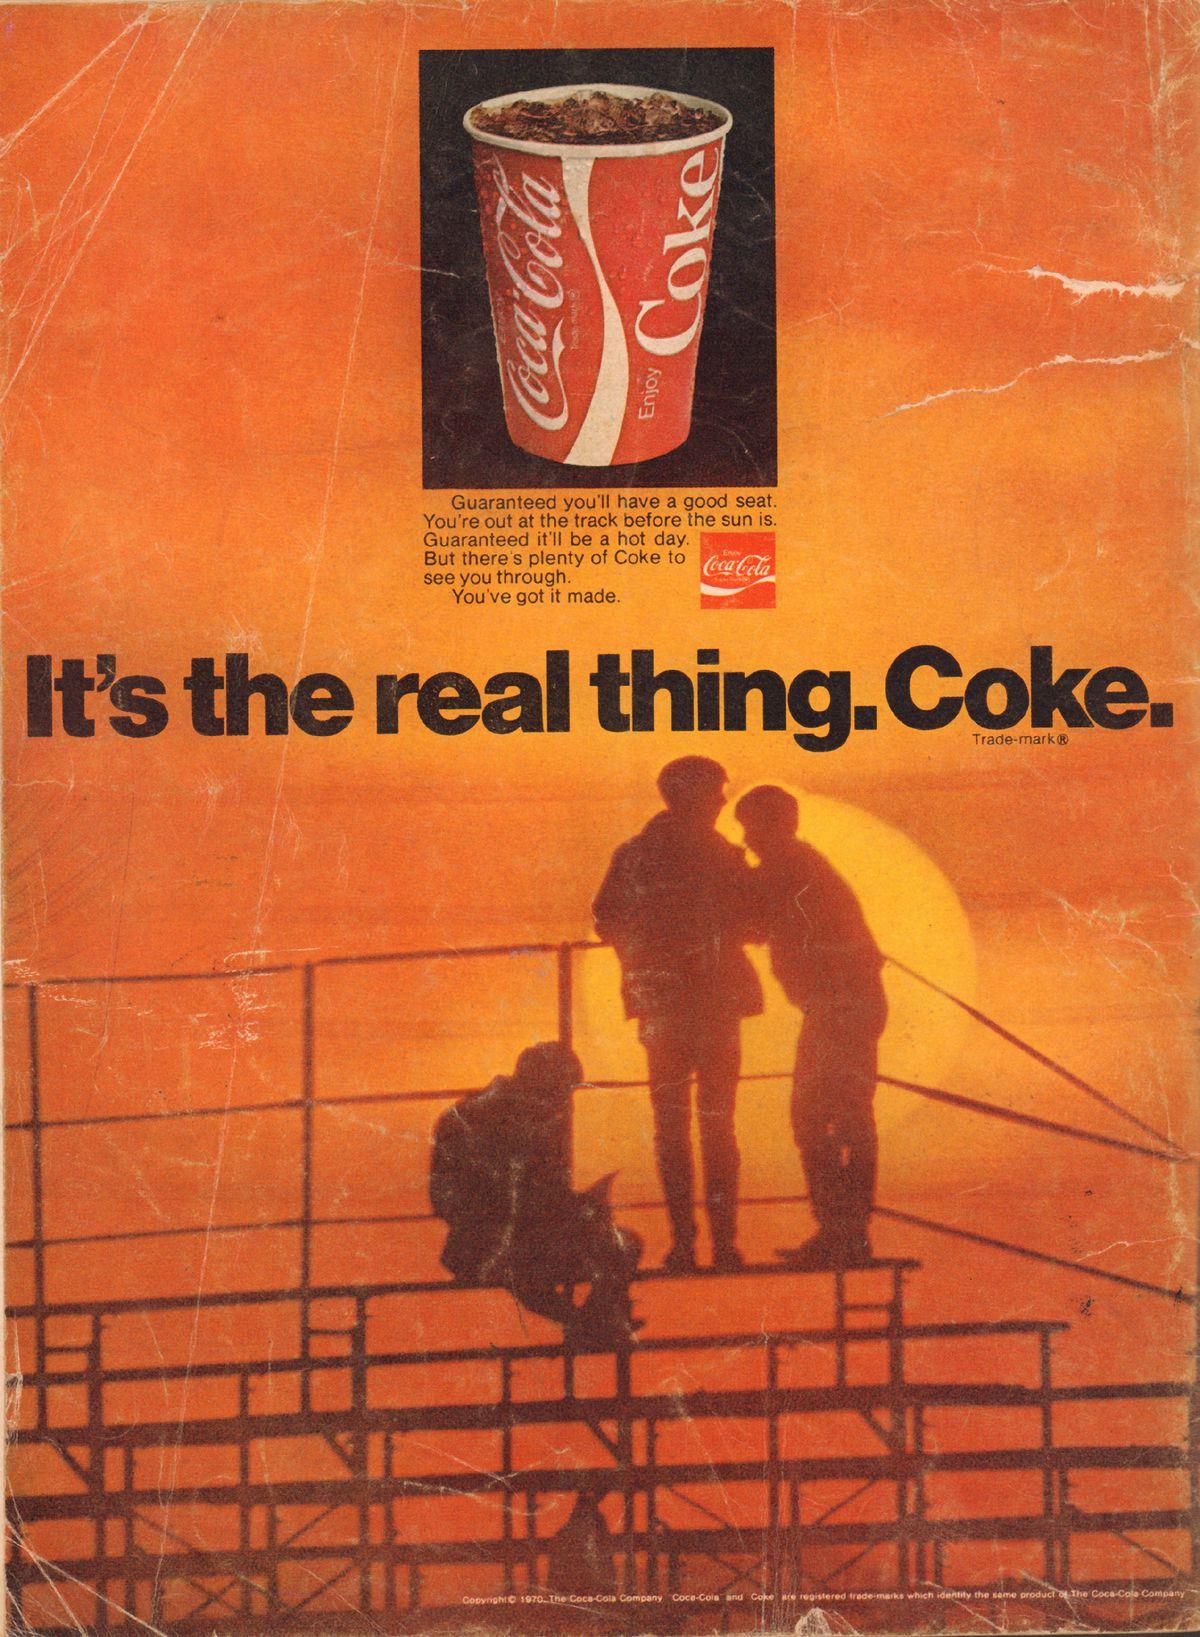 A 1970 Coke ad.